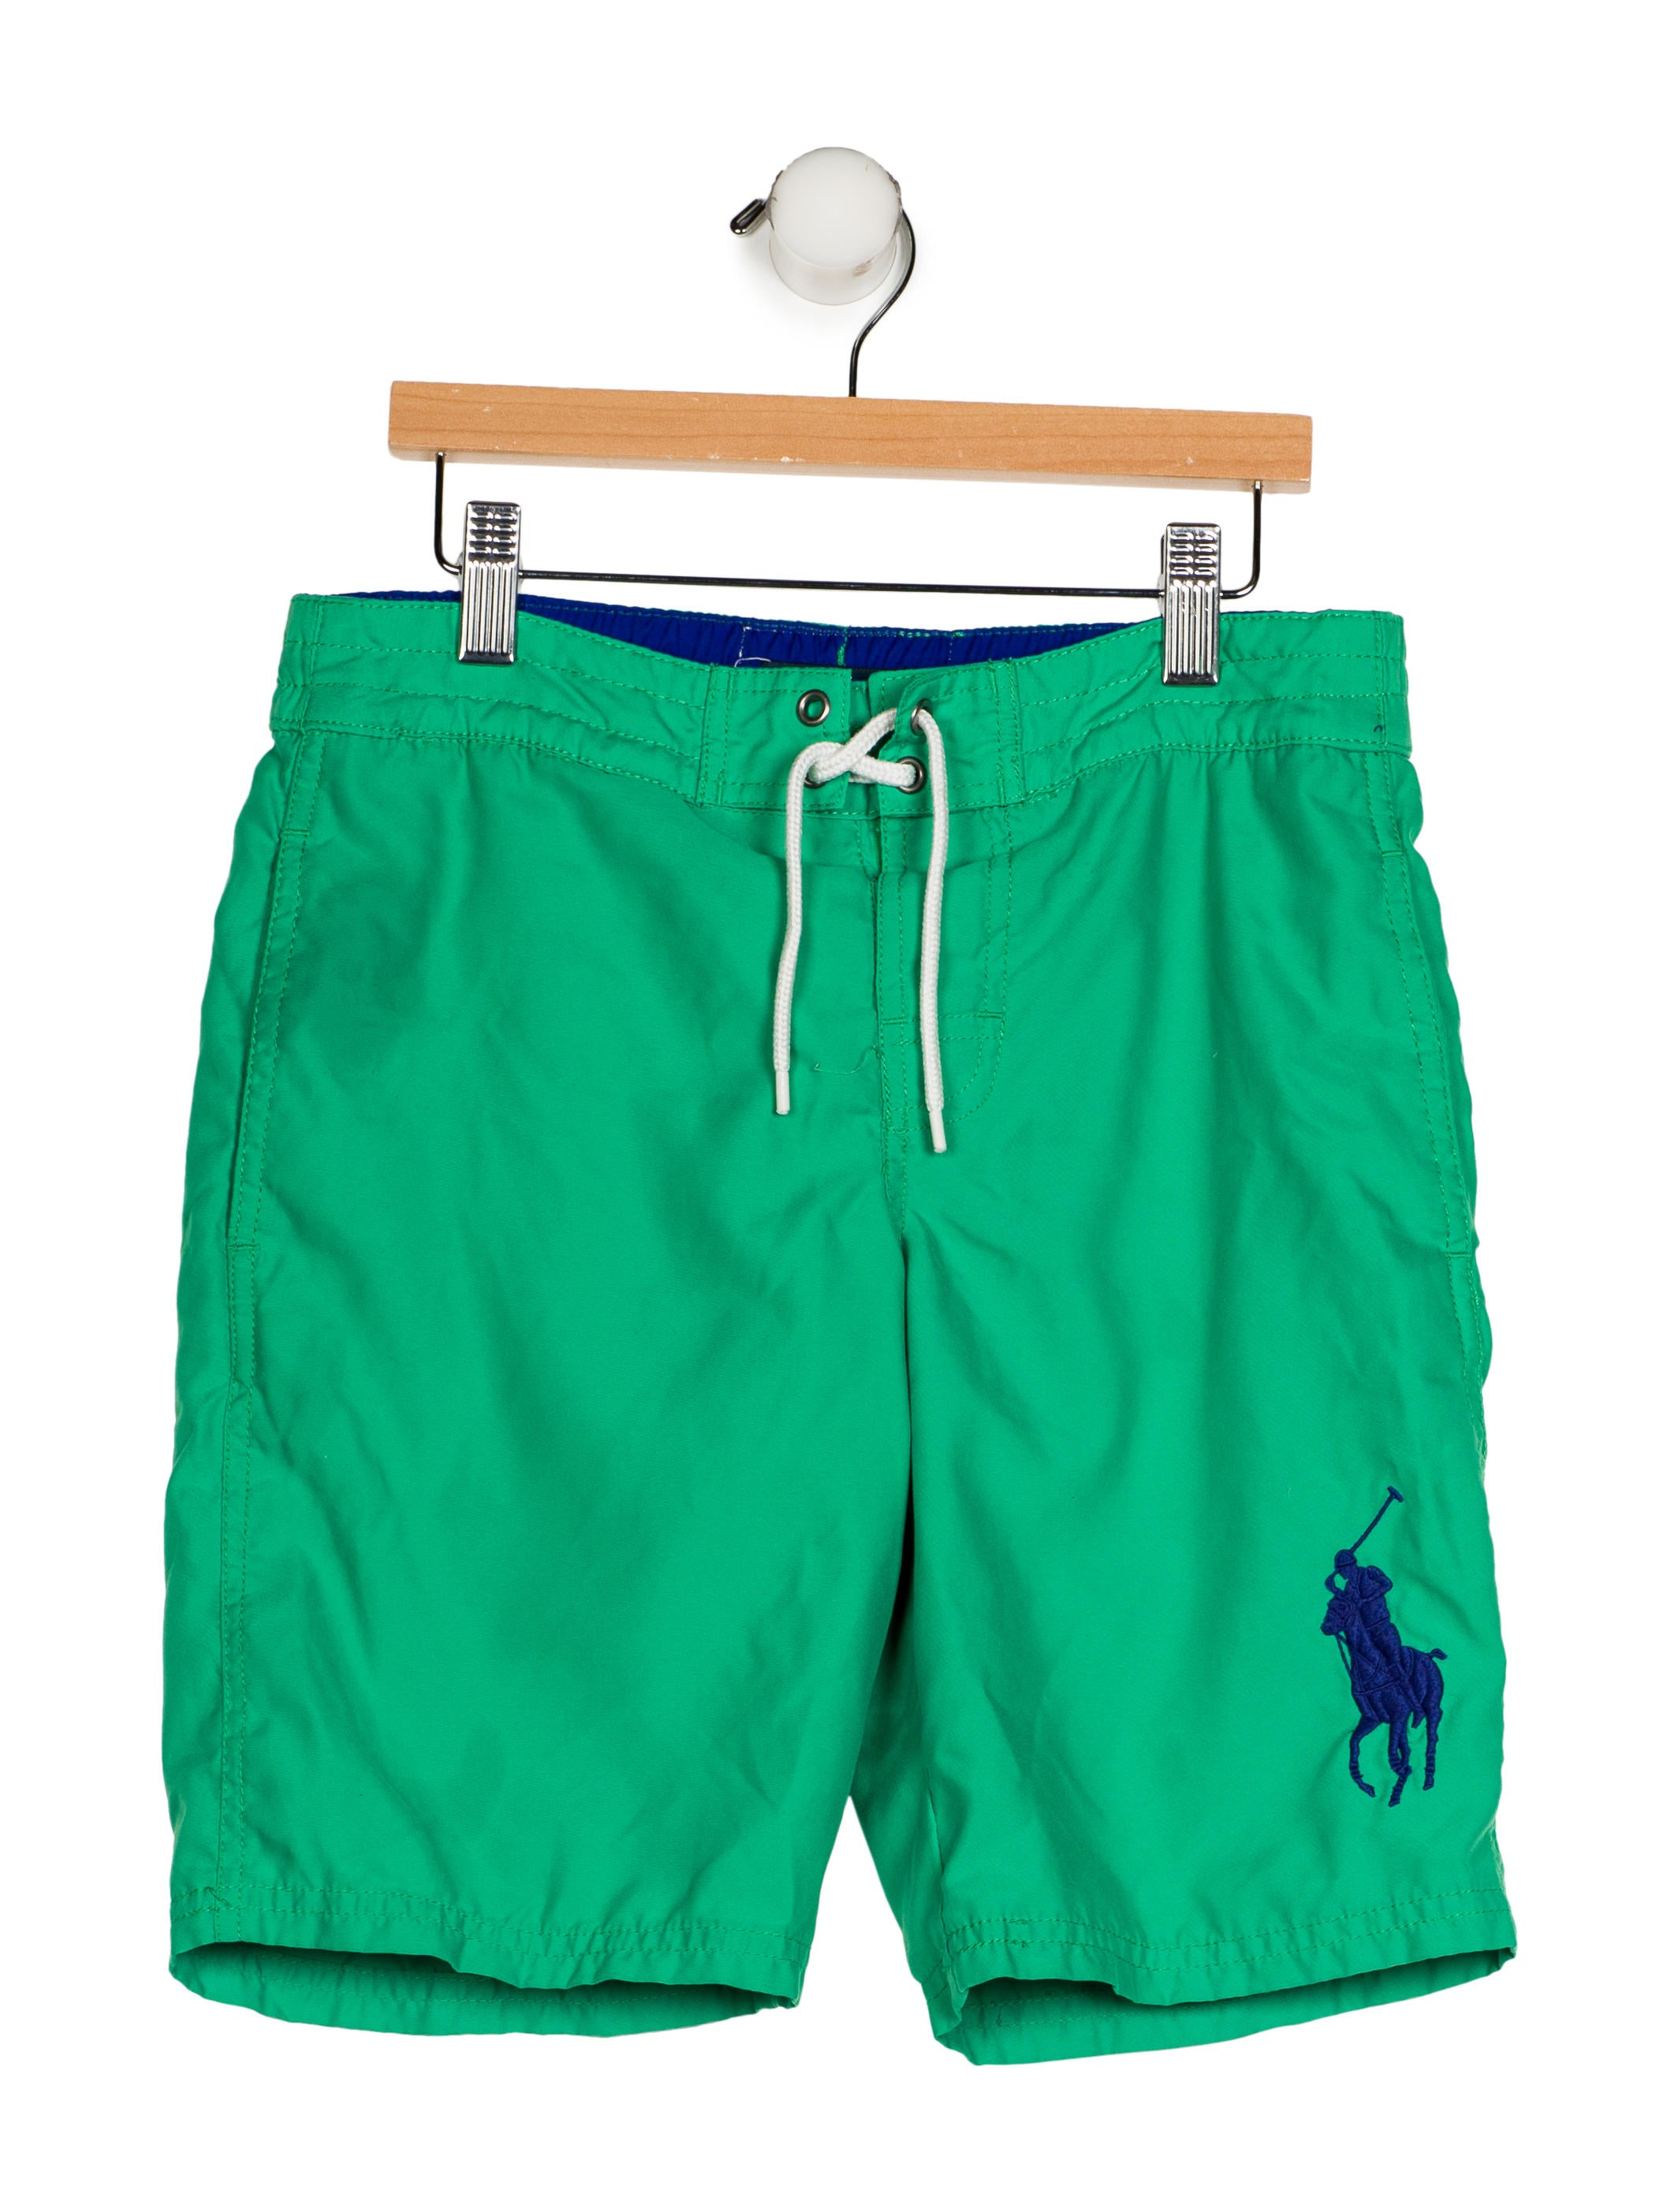 4fcdcdcd72c6c Polo Ralph Lauren Boys' Swim Shorts - Boys - WPRLN22247   The RealReal